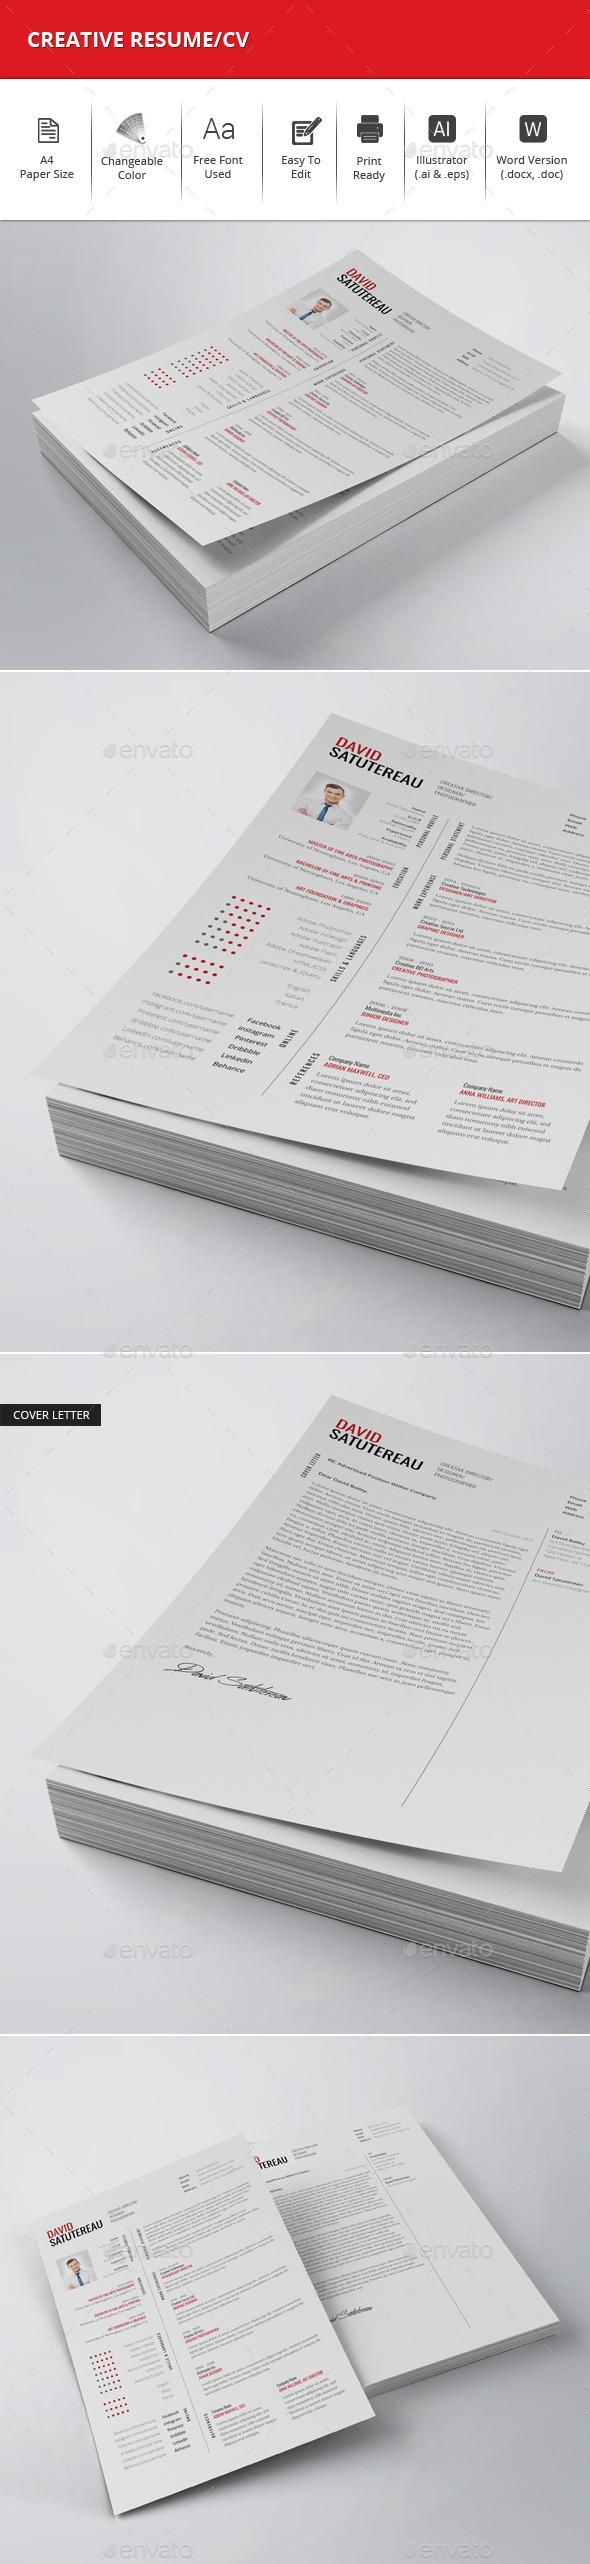 Creative Resume/CV - Resumes Stationery